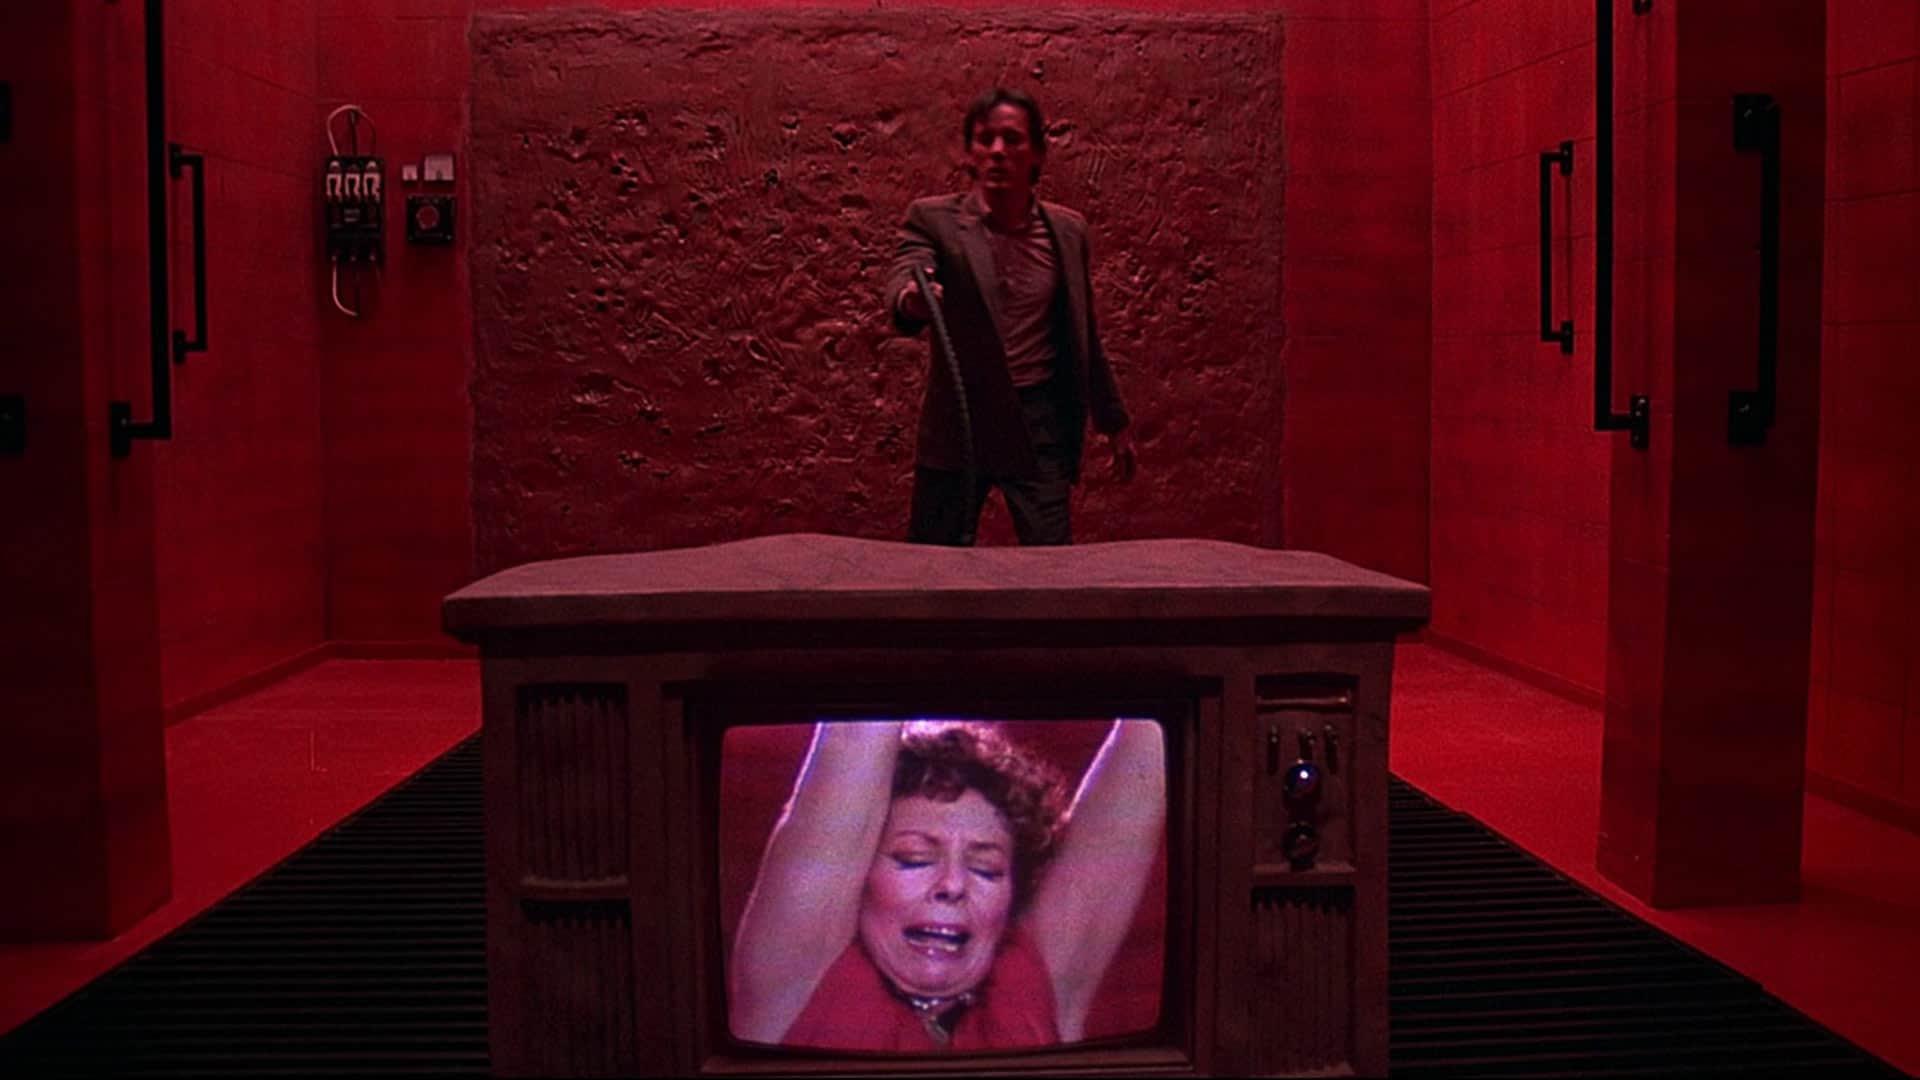 videodrome david cronenberg